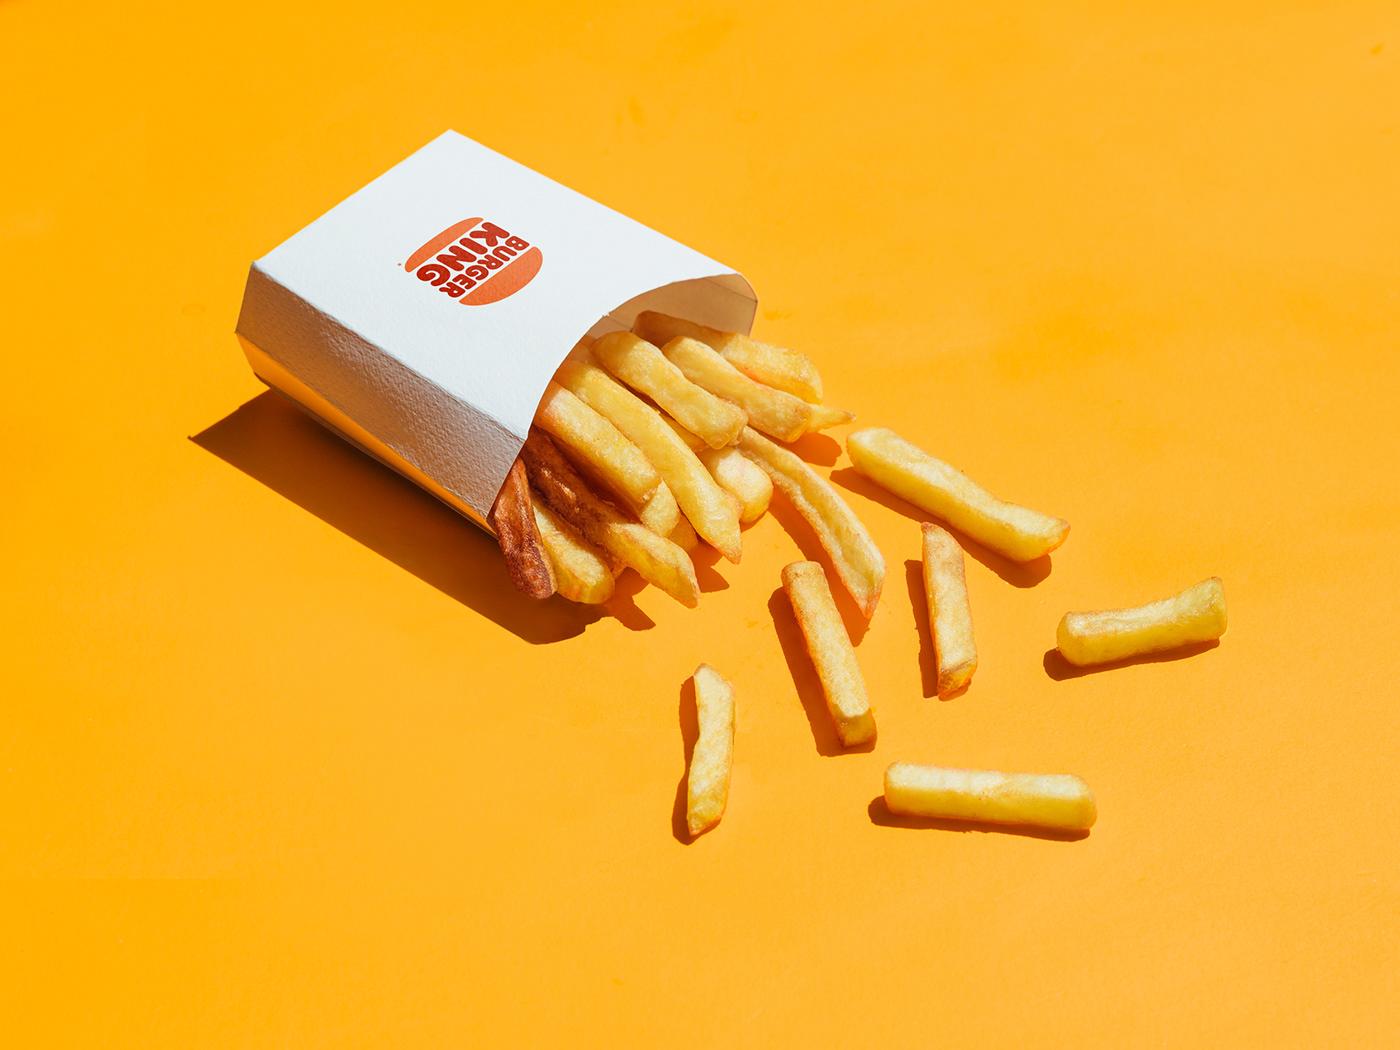 Advertising  burgerking Fries